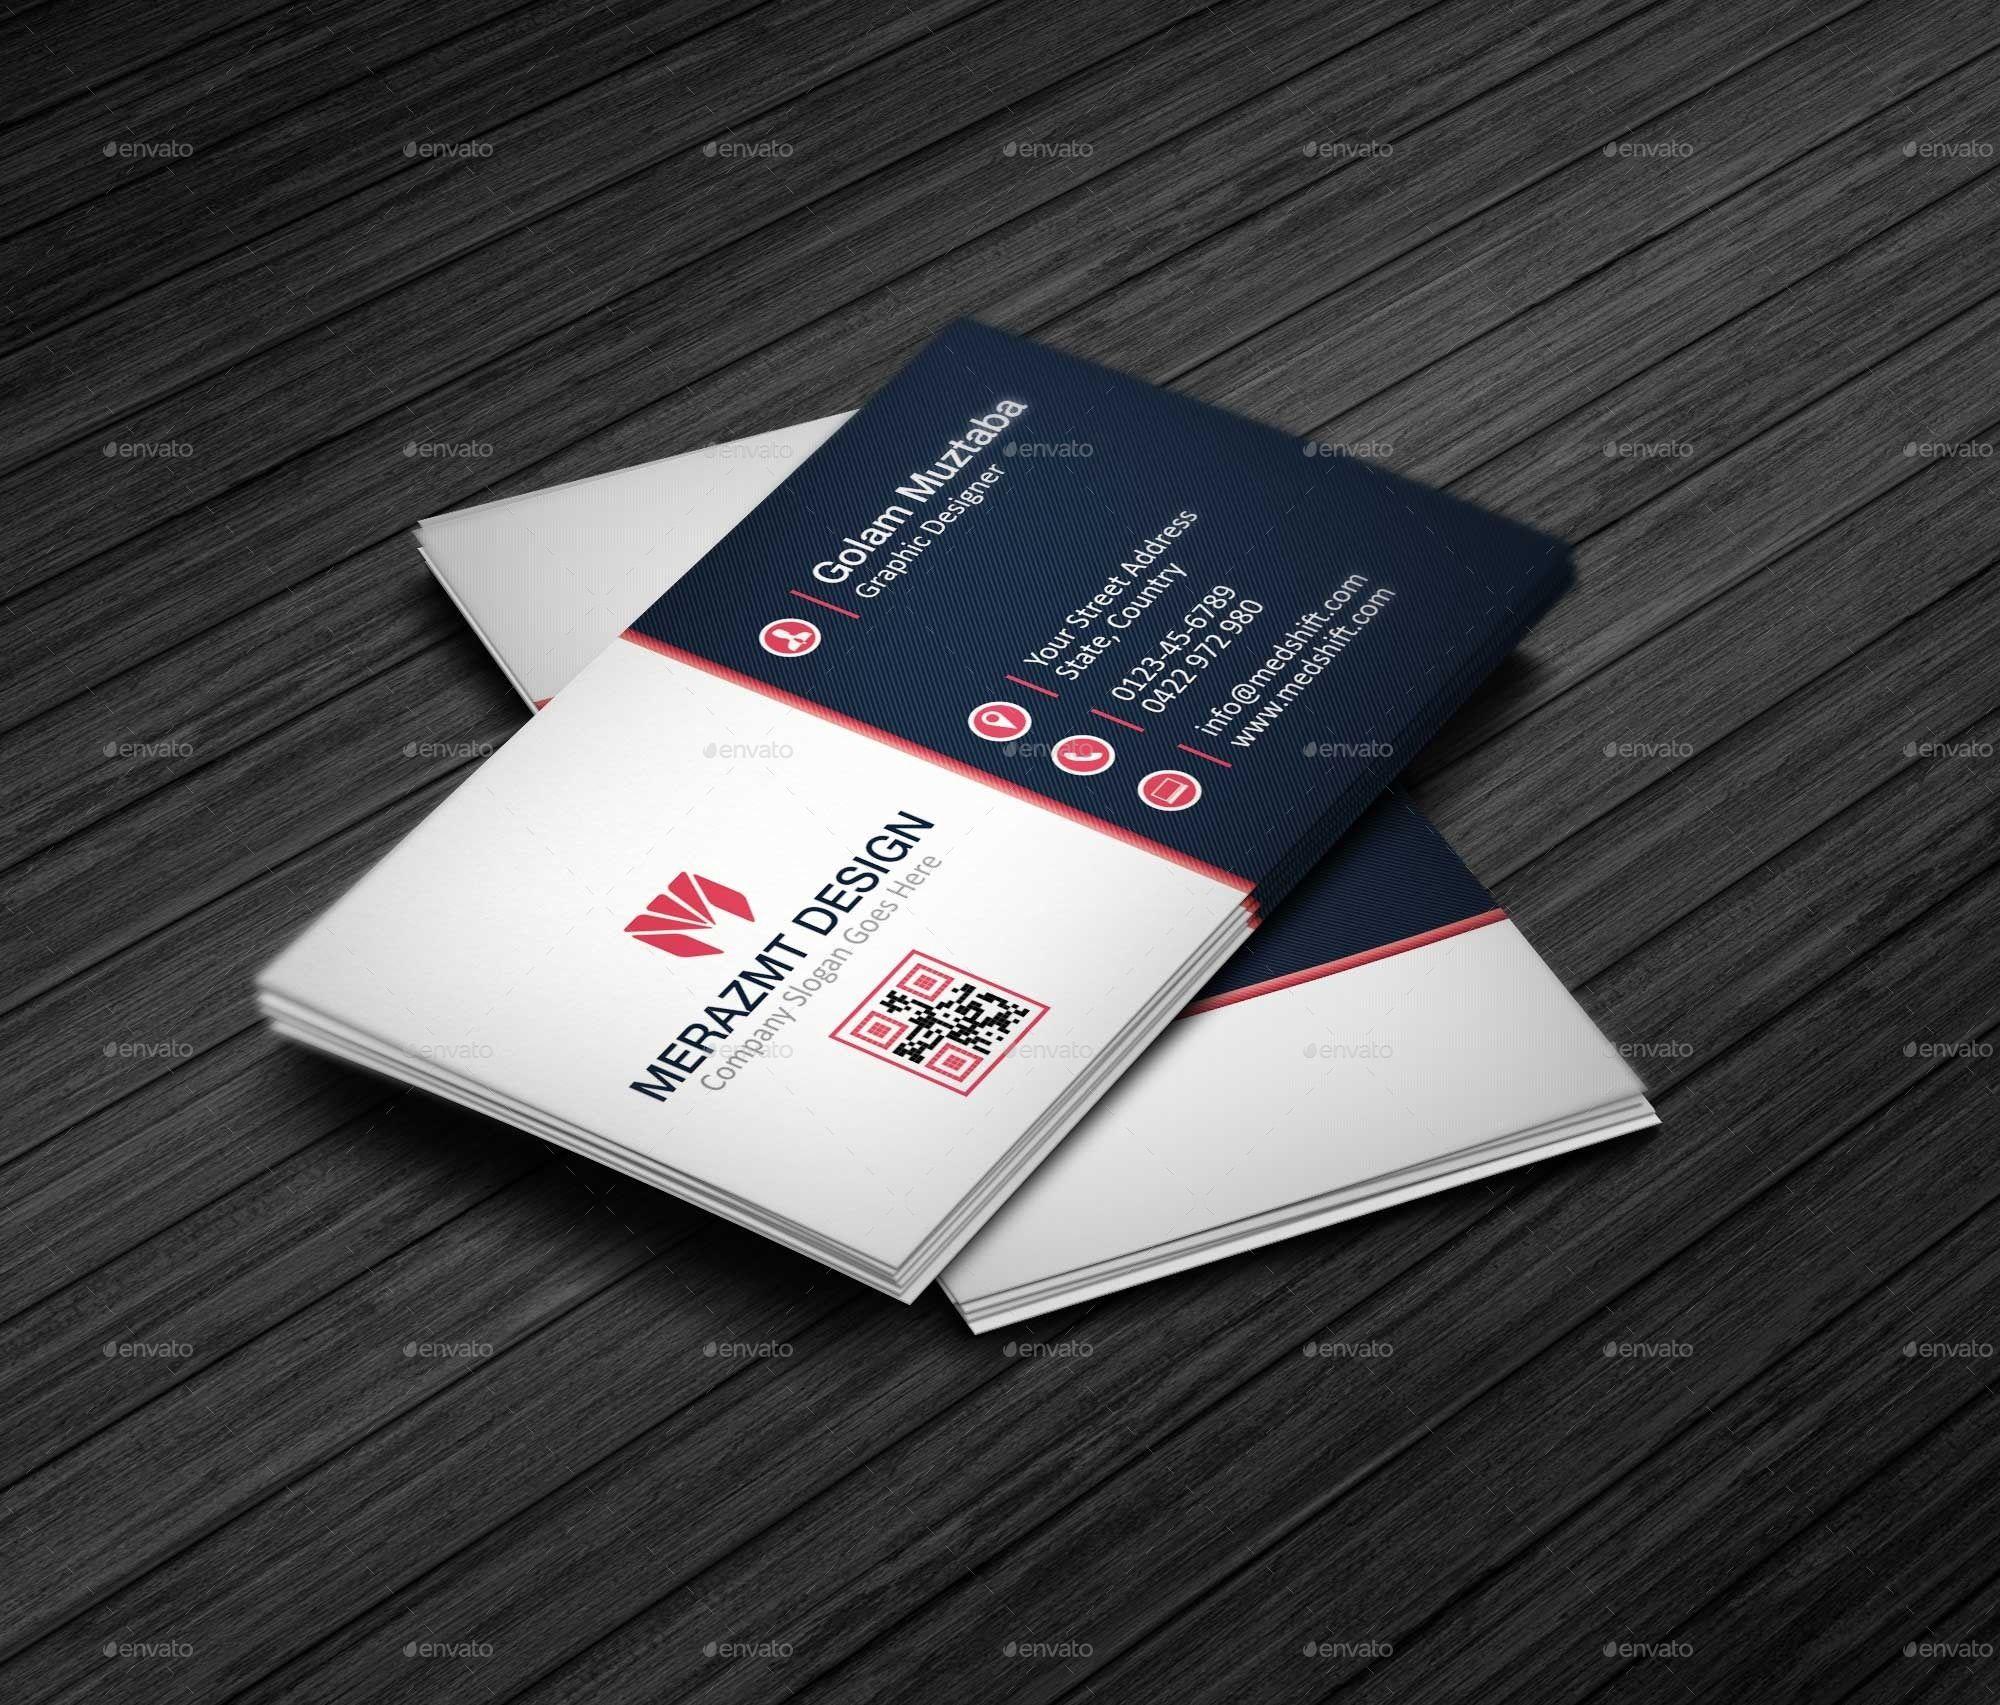 Creative Business Card Business Cards Creative Business Cards Creative Templates Business Cards